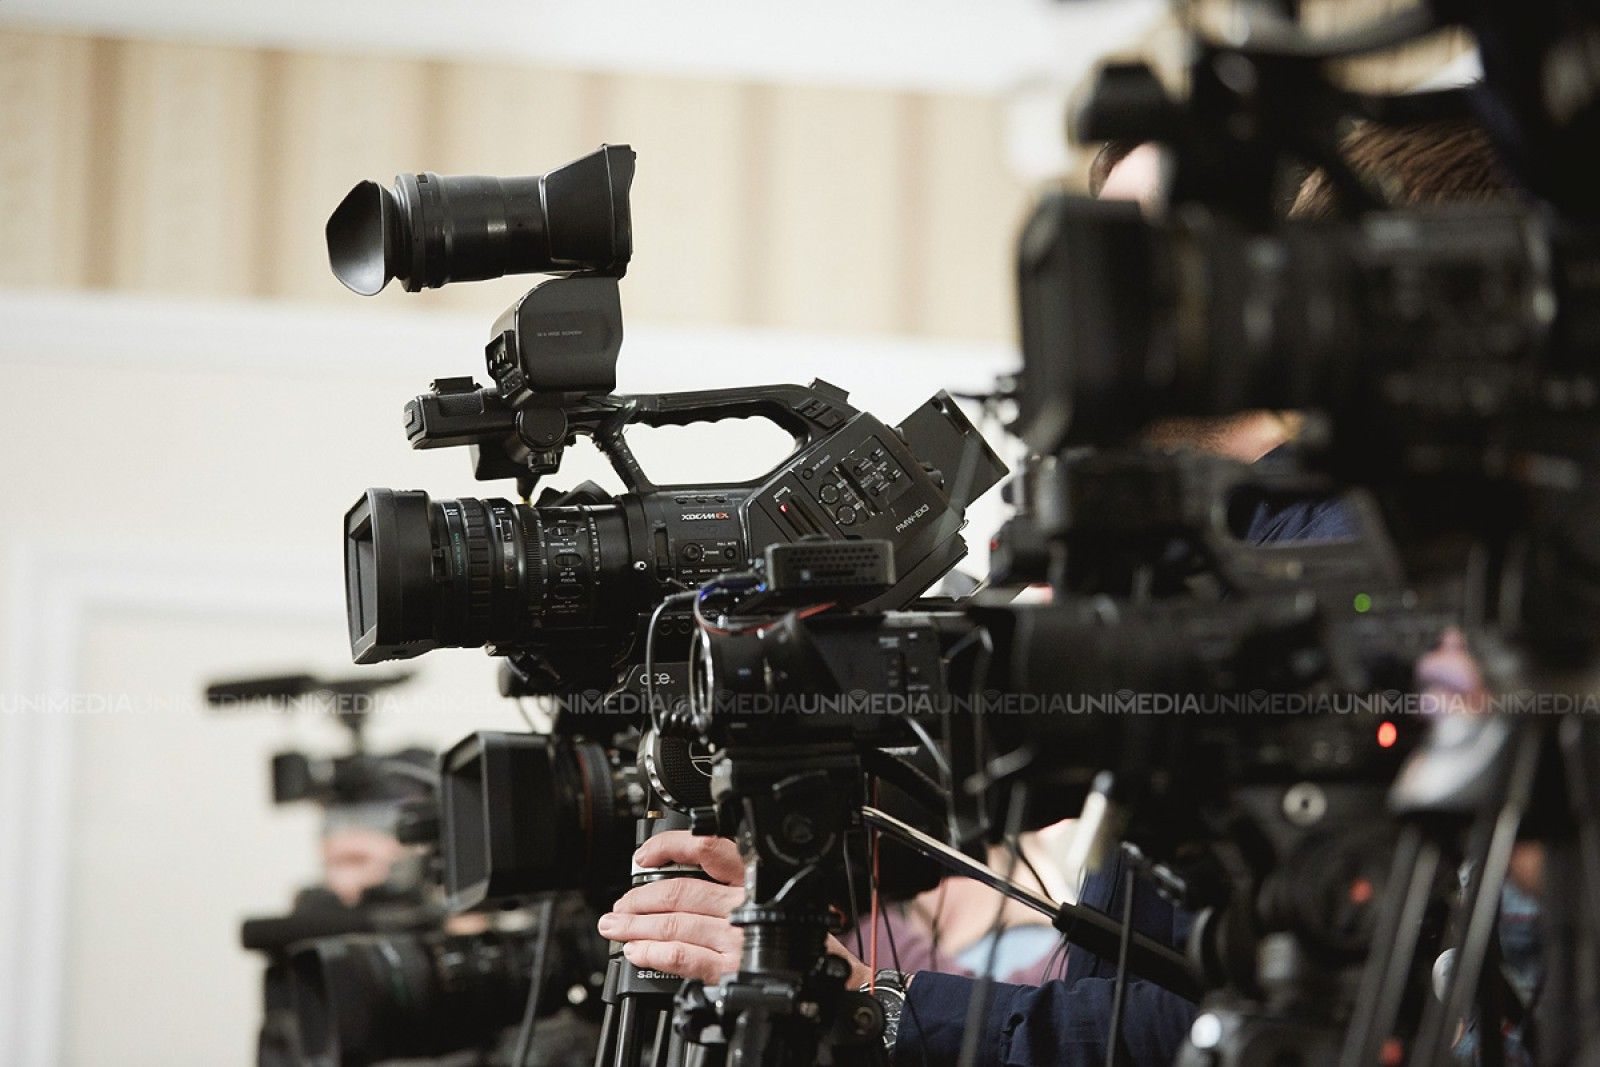 (video) 12 instituții media, analizate de Centrul pentru Jurnalism Independent. Principalele subiecte monitorizate